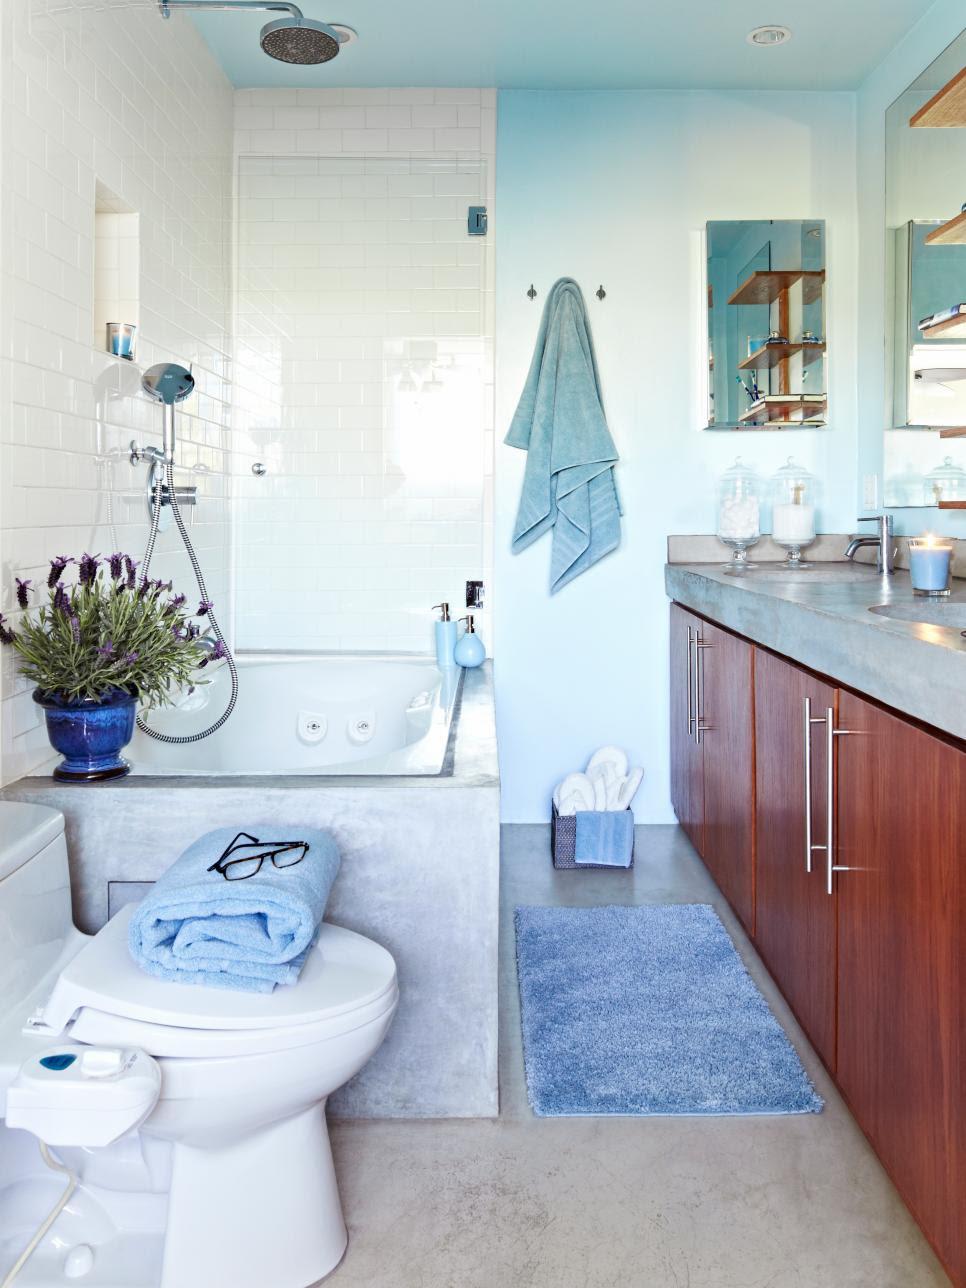 Cool Blue, Spa-Like Bathroom | HGTV